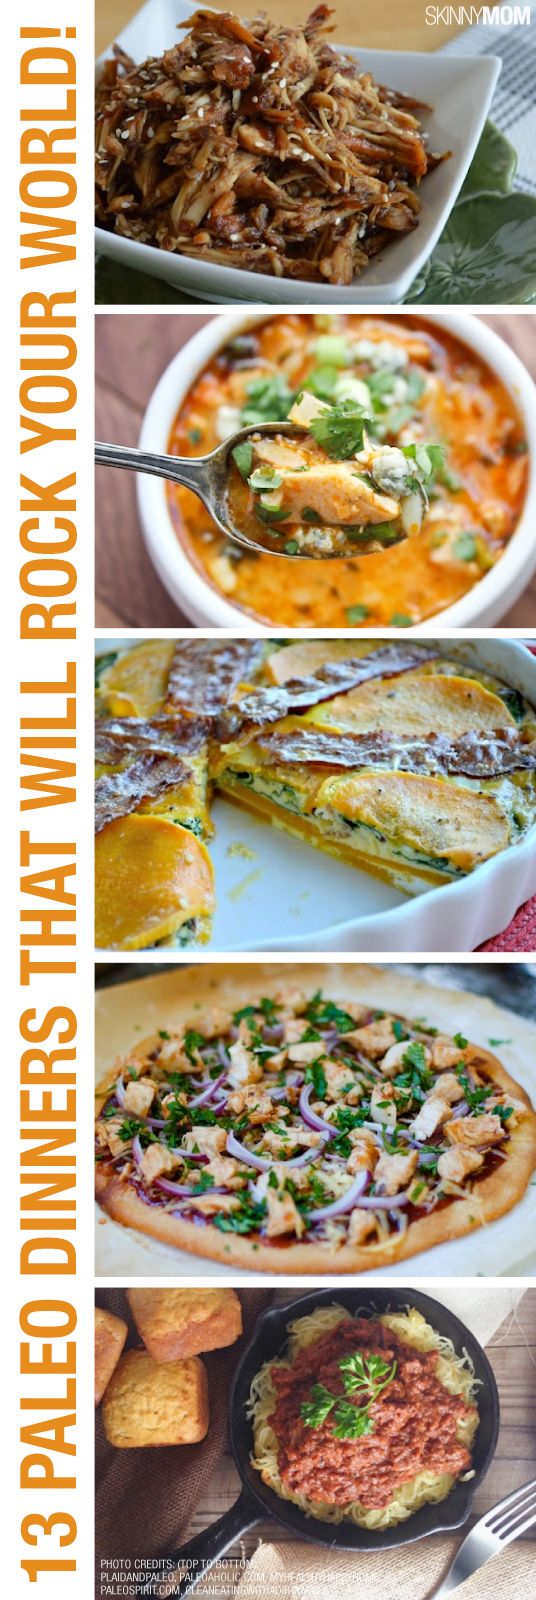 Paleo recipes everyone will love.